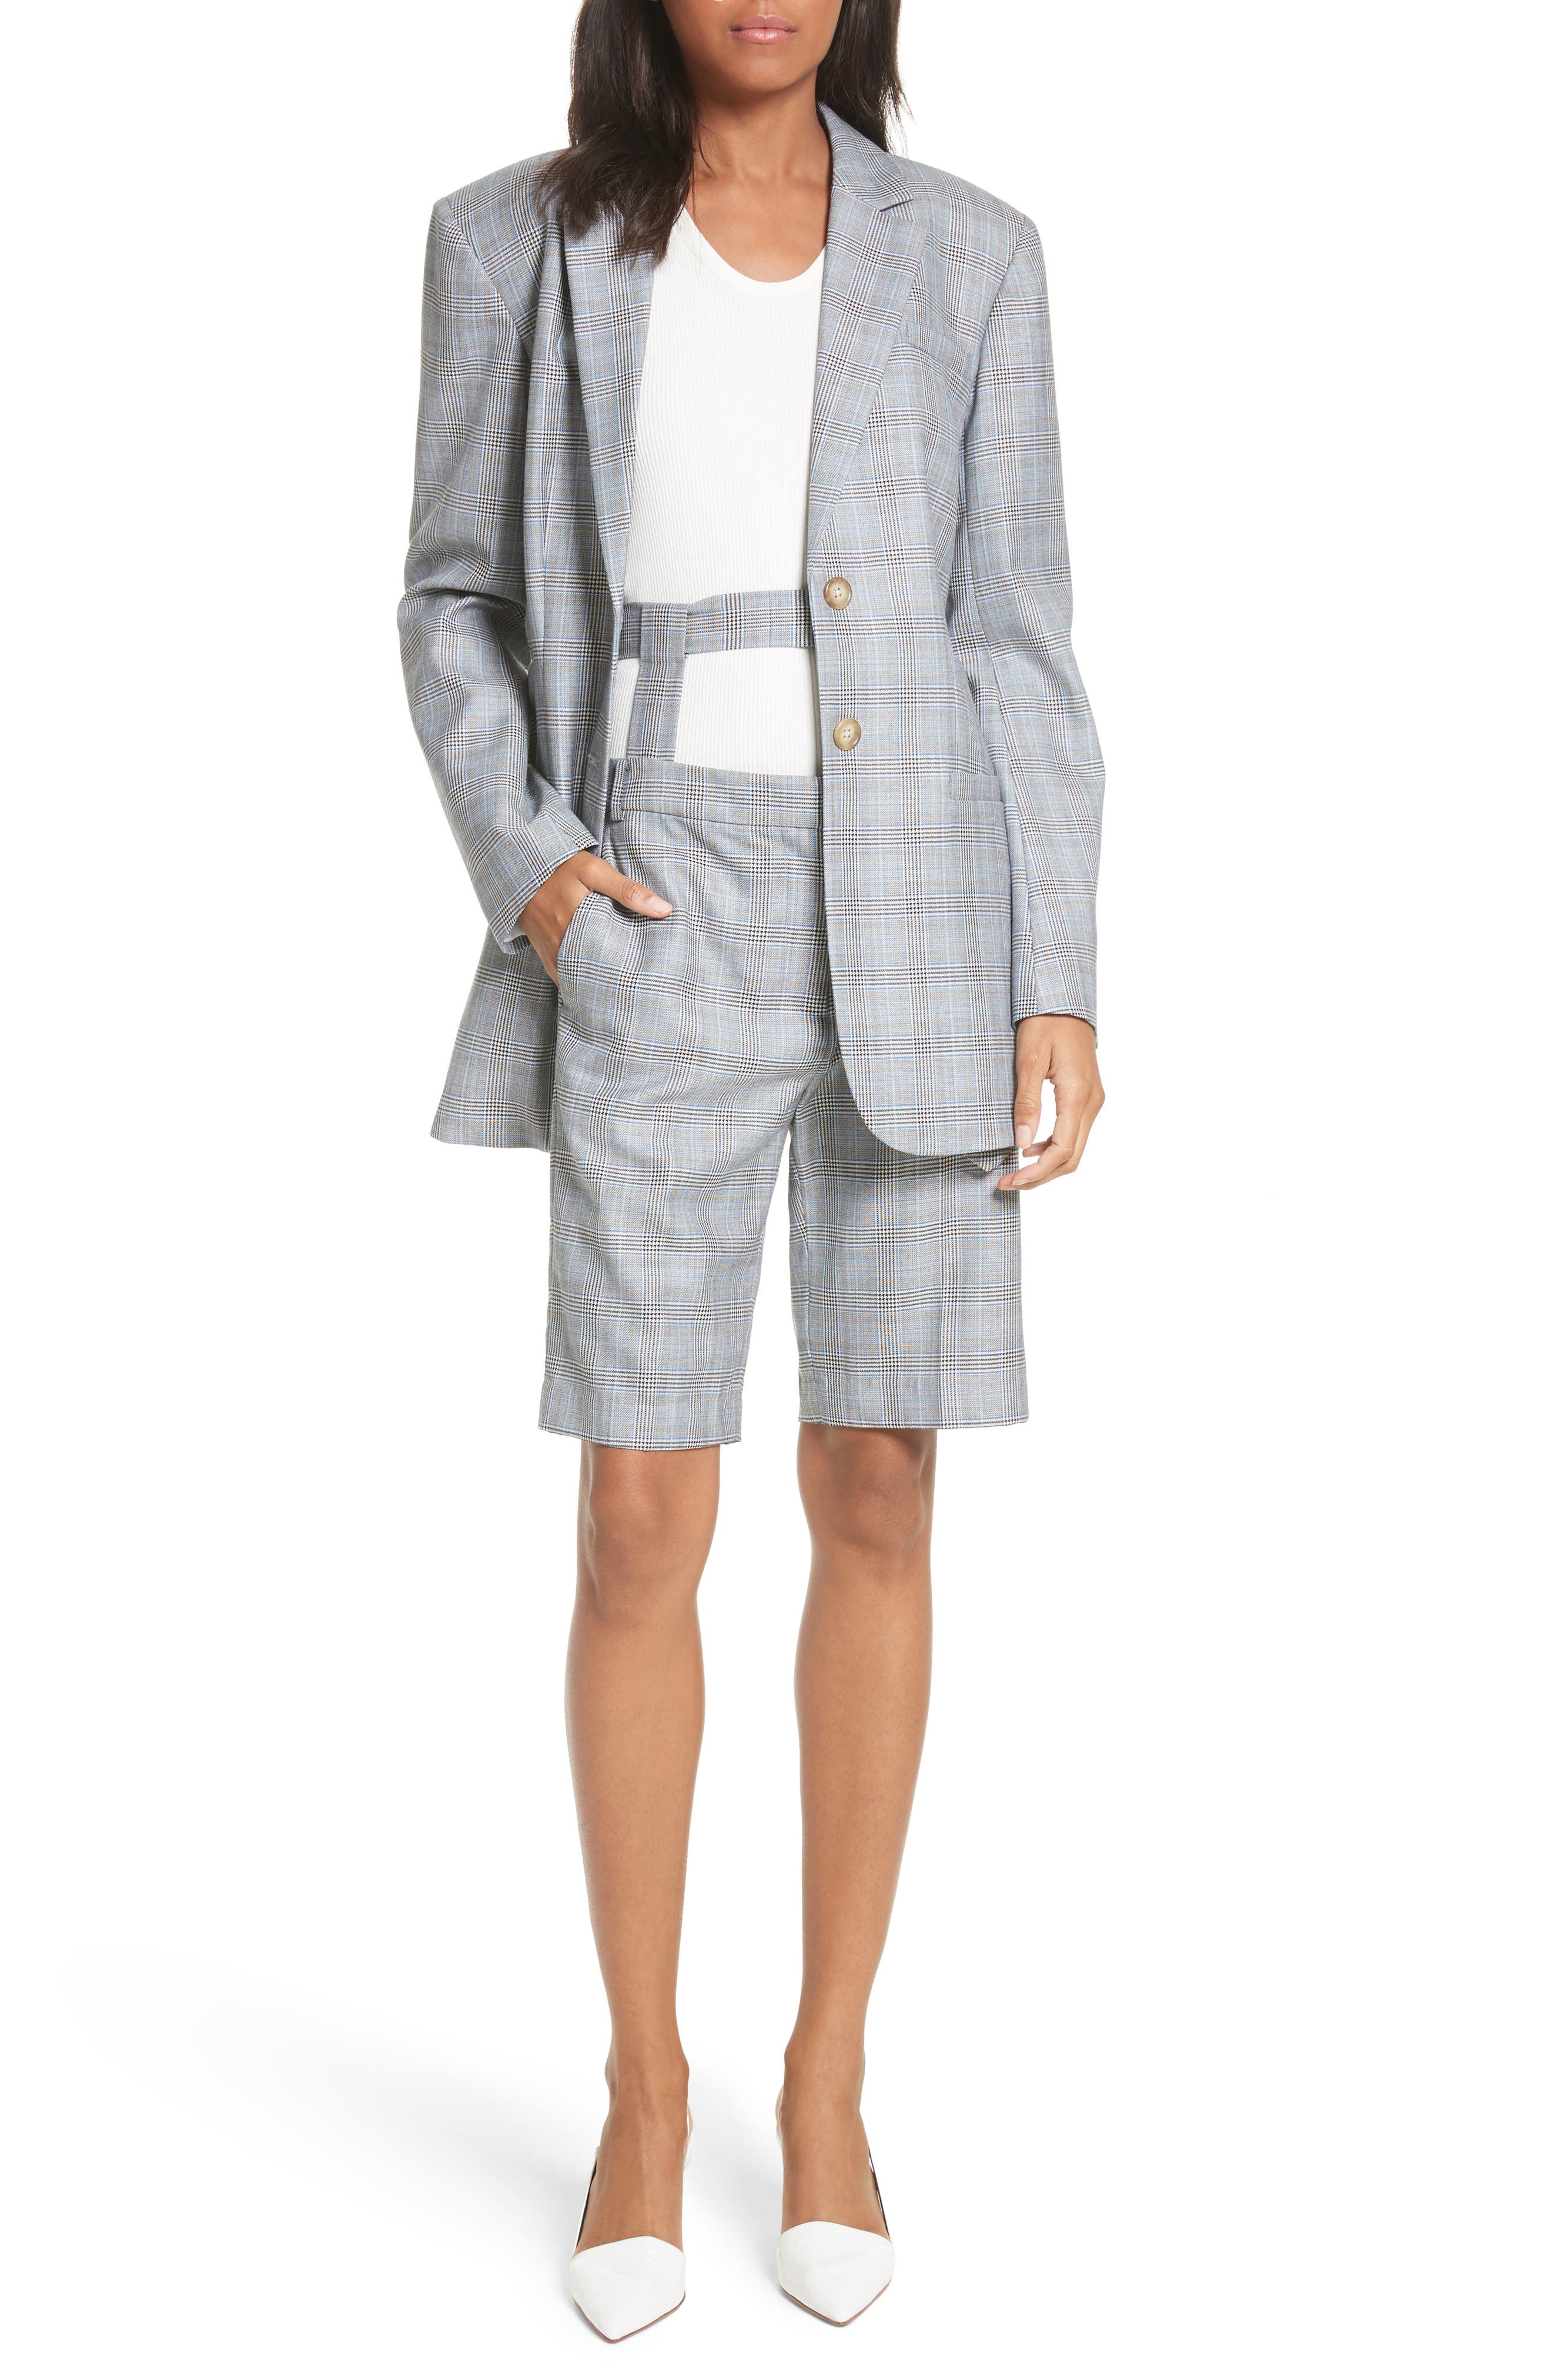 Removable Corset Plaid Shorts,                             Alternate thumbnail 7, color,                             020